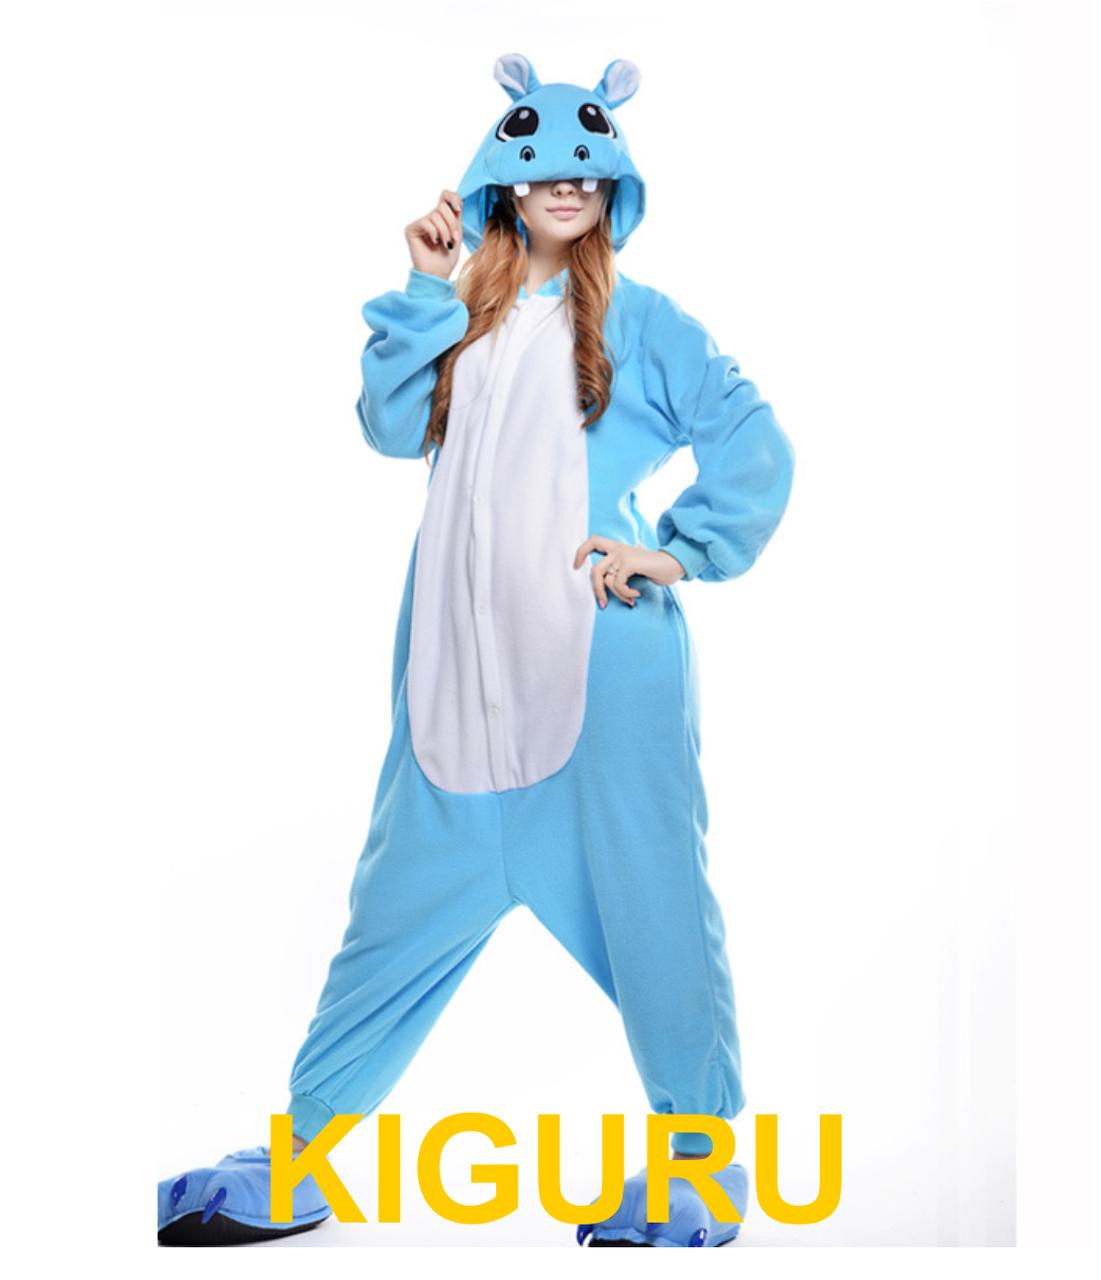 8888a2c846fca Теплая пижама костюм кигуруми бегемот Hippo, цена 699 грн., купить в ...